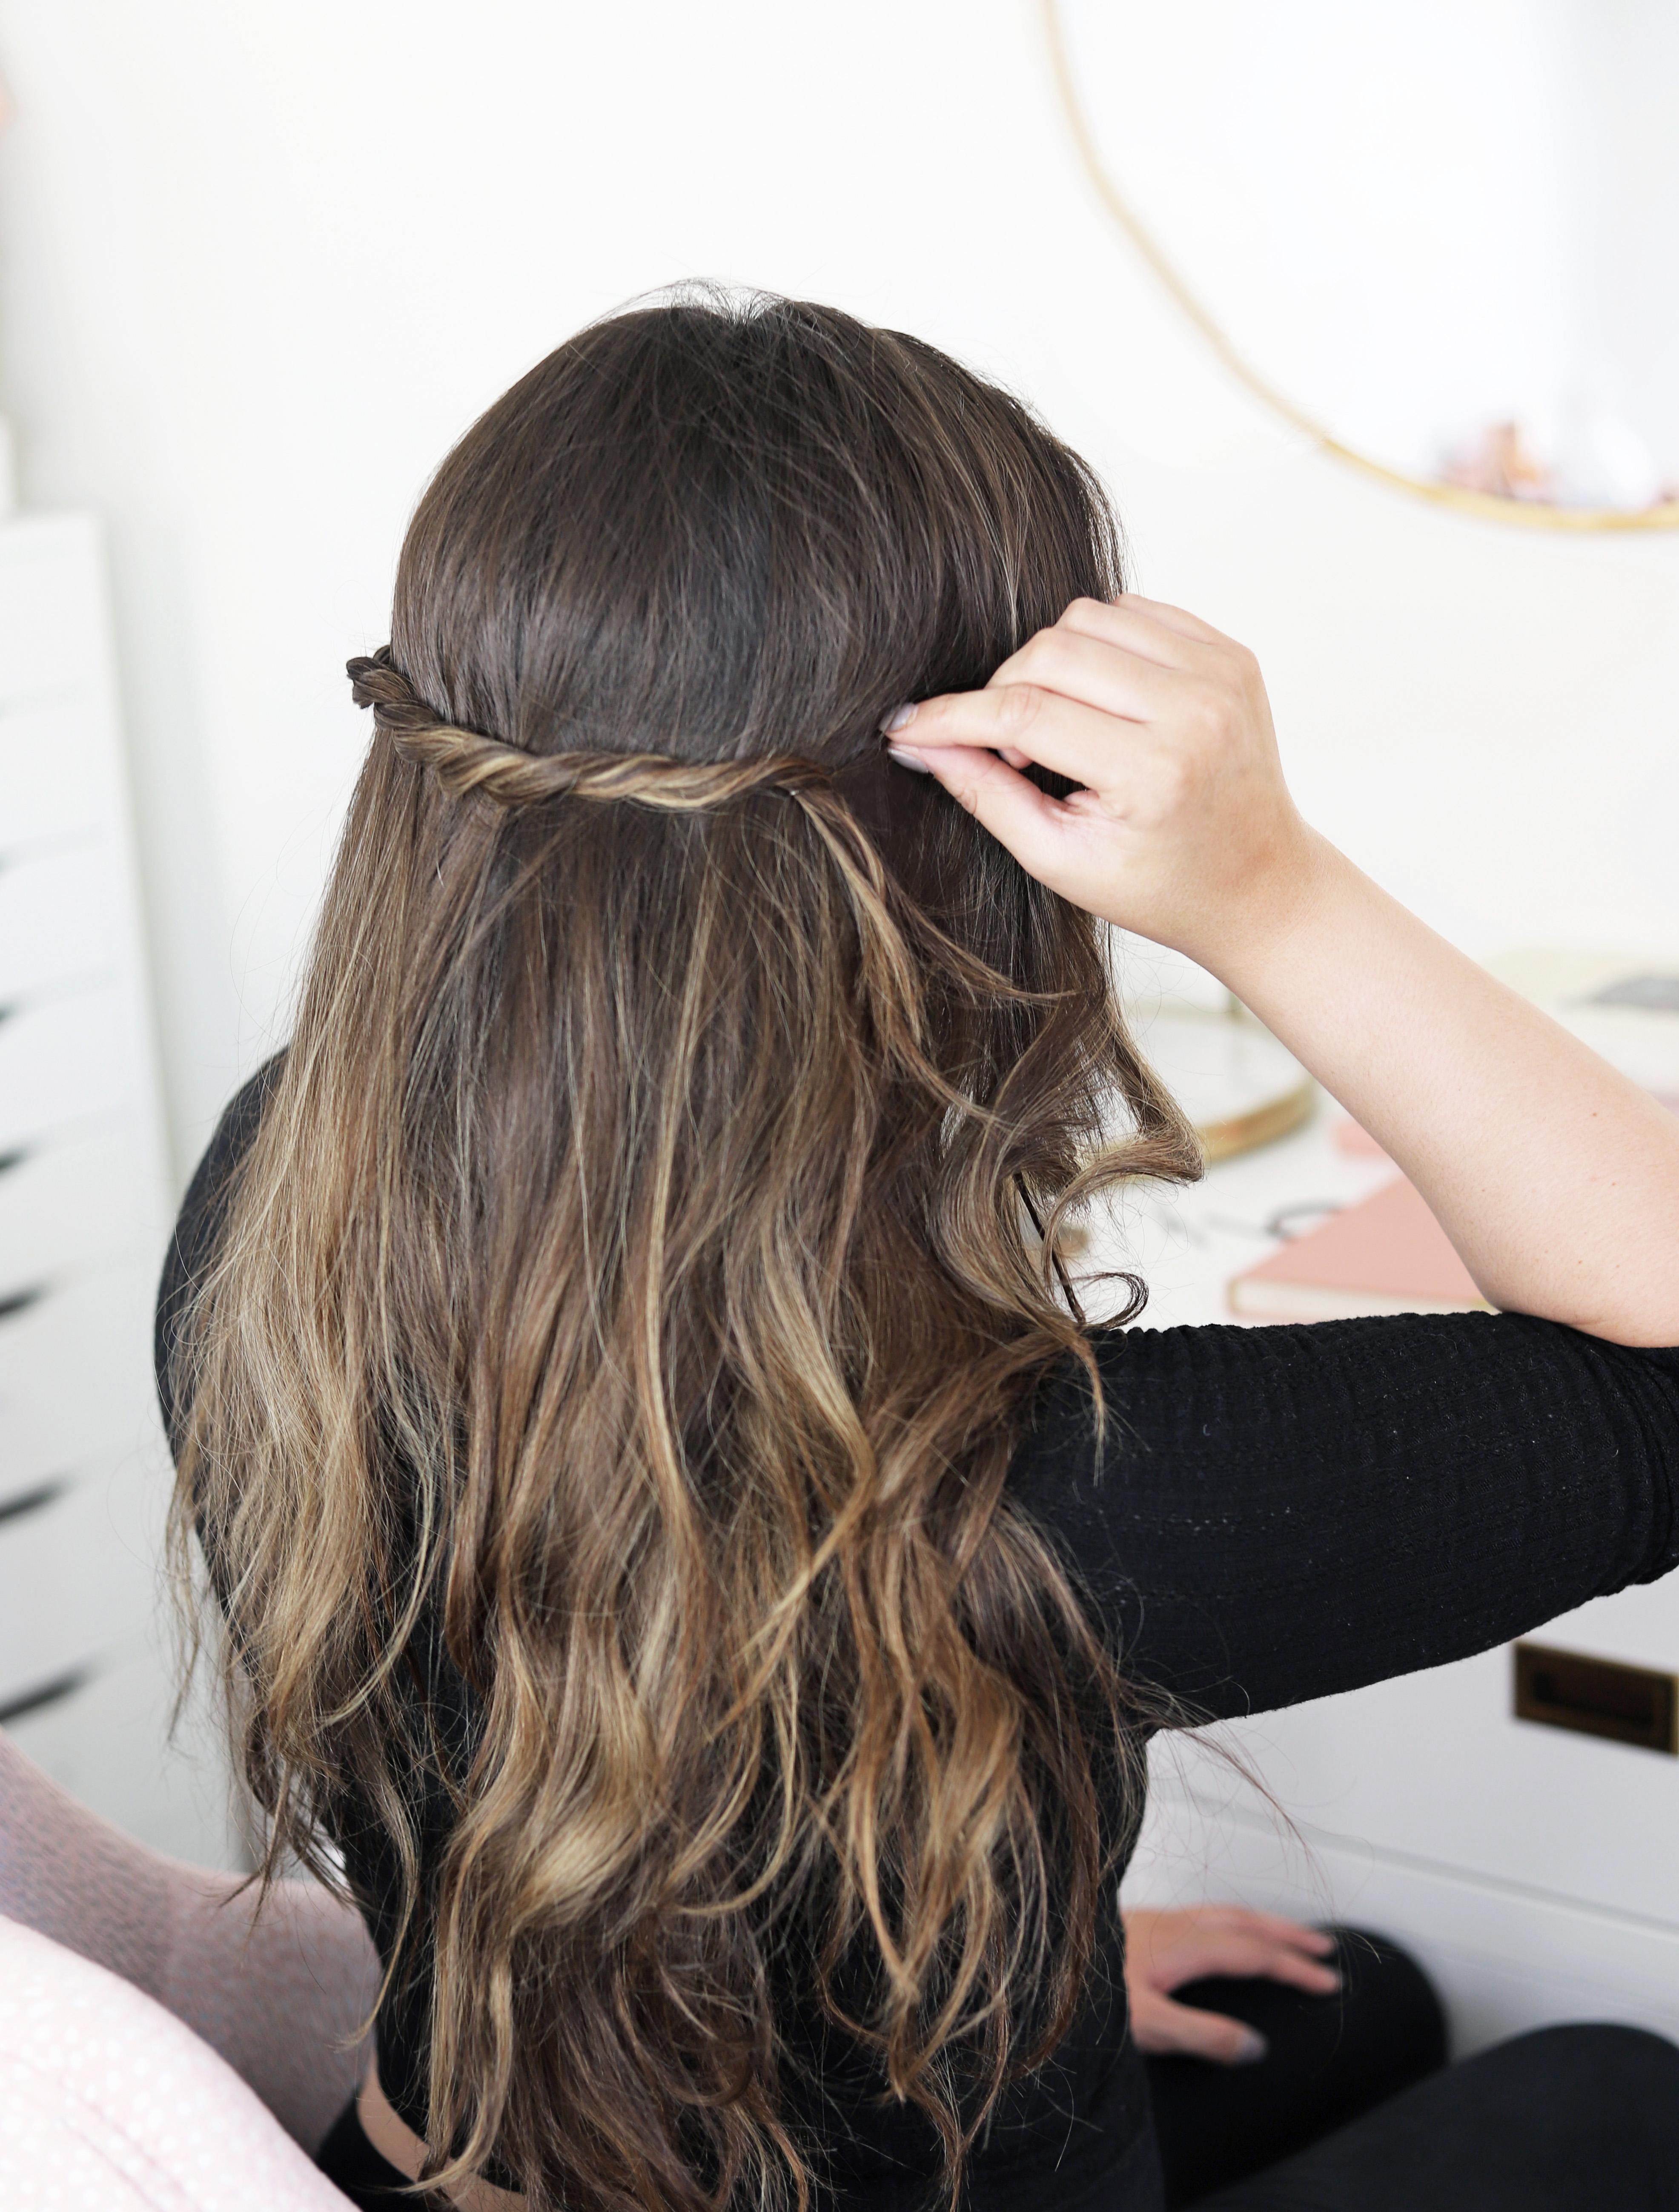 Mash elle beauty blogger | hairstyle | hair tutorial | Pantene | long hair | fall hairstyles | hair inspiration | romantic hair | braid